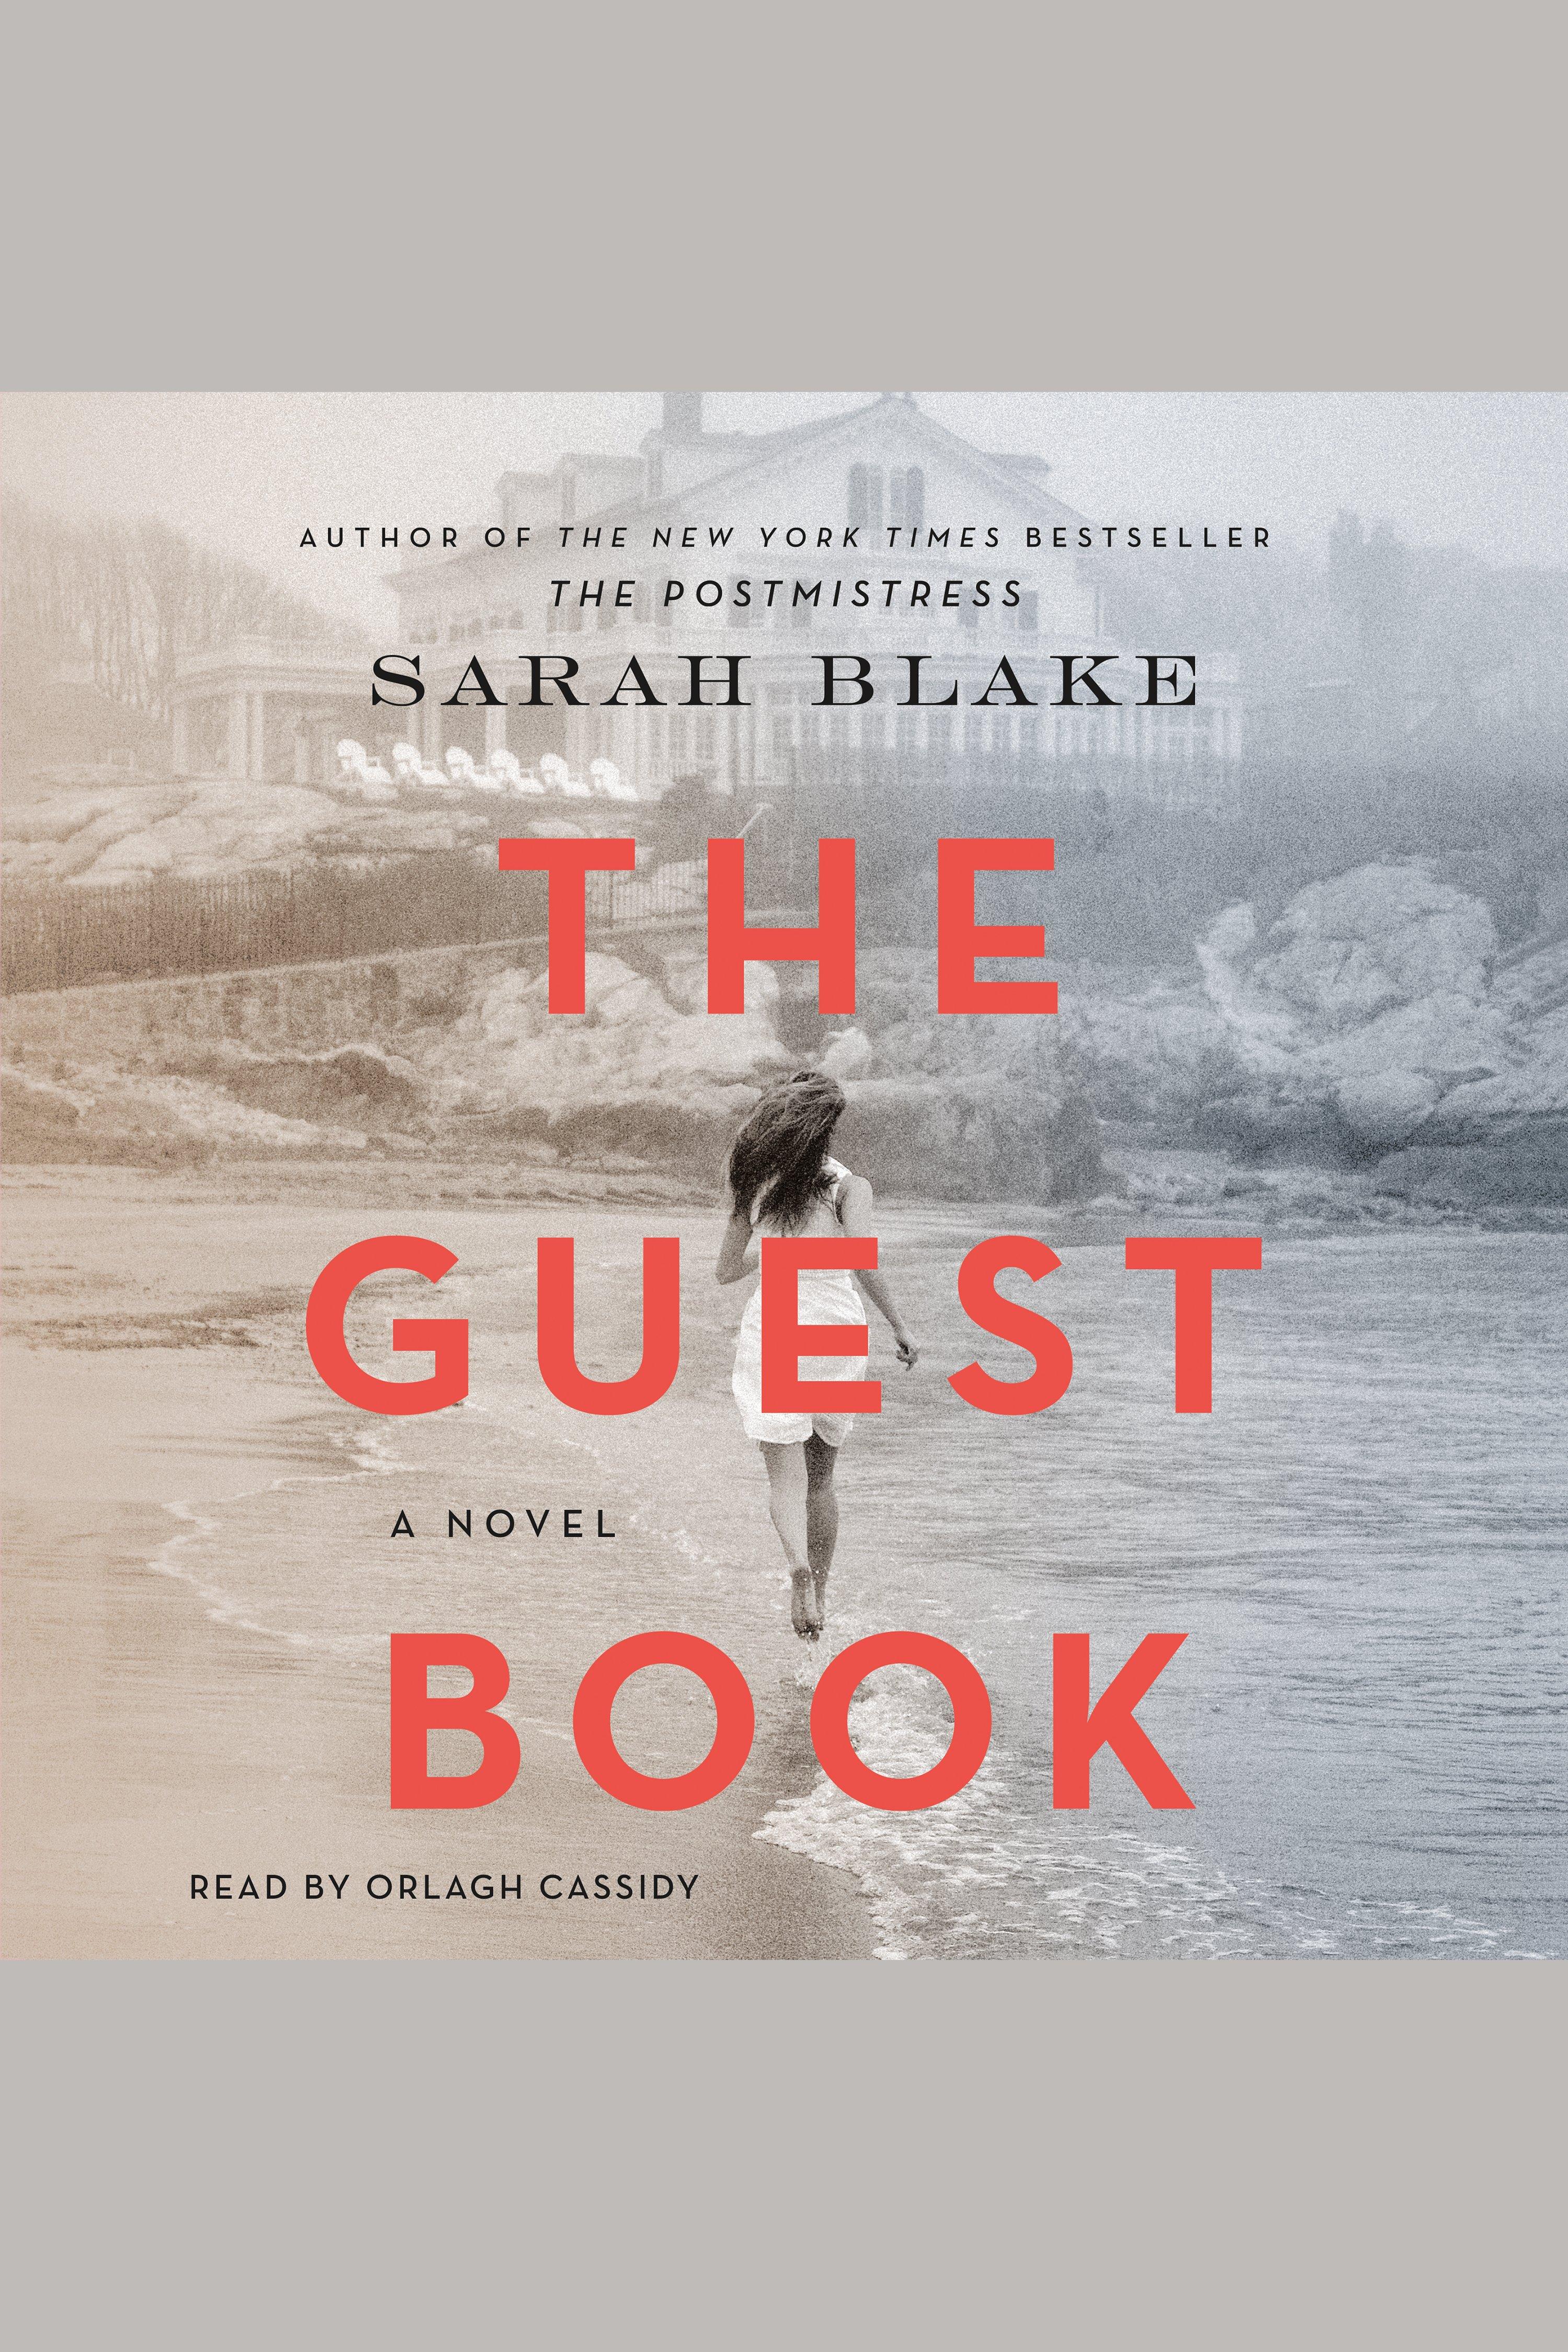 Guest Book, The A Novel